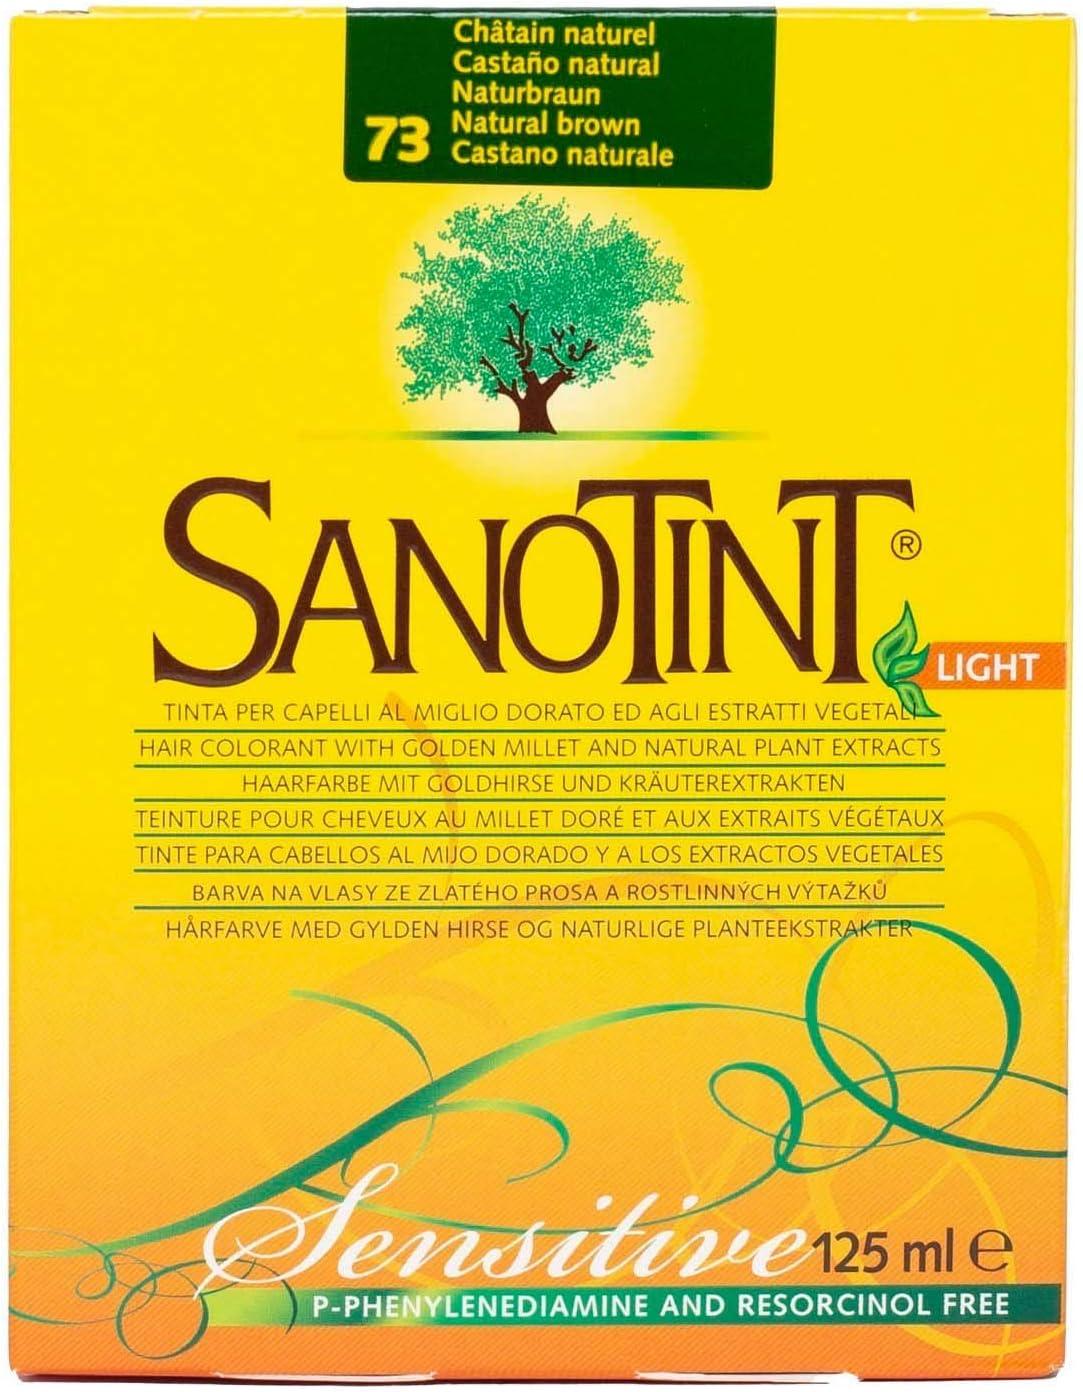 Sanotint Sanotint Sensitive 73 Castaño Natural - 300 g